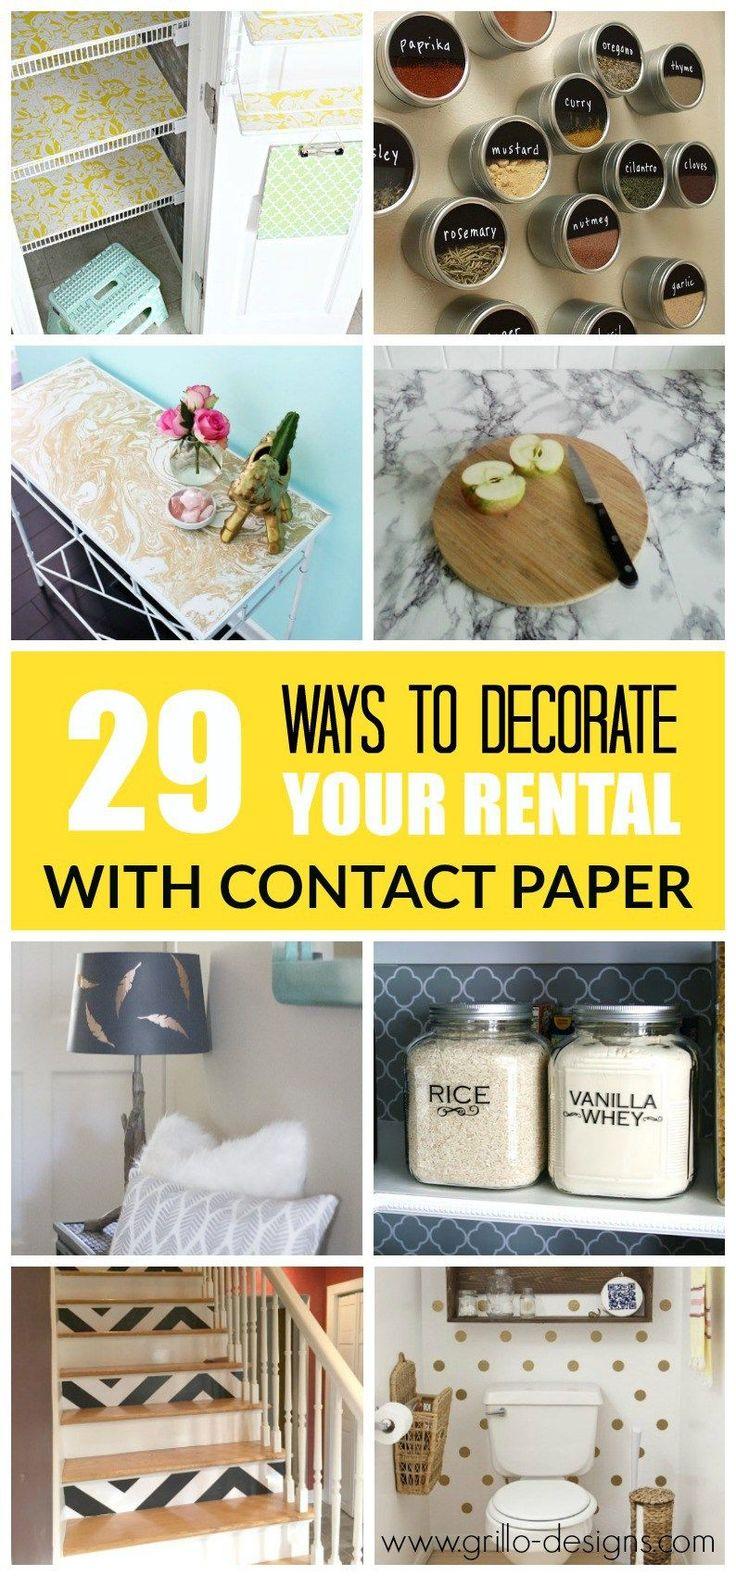 Best 25 Rental Decorating Ideas On Pinterest Renting Washi